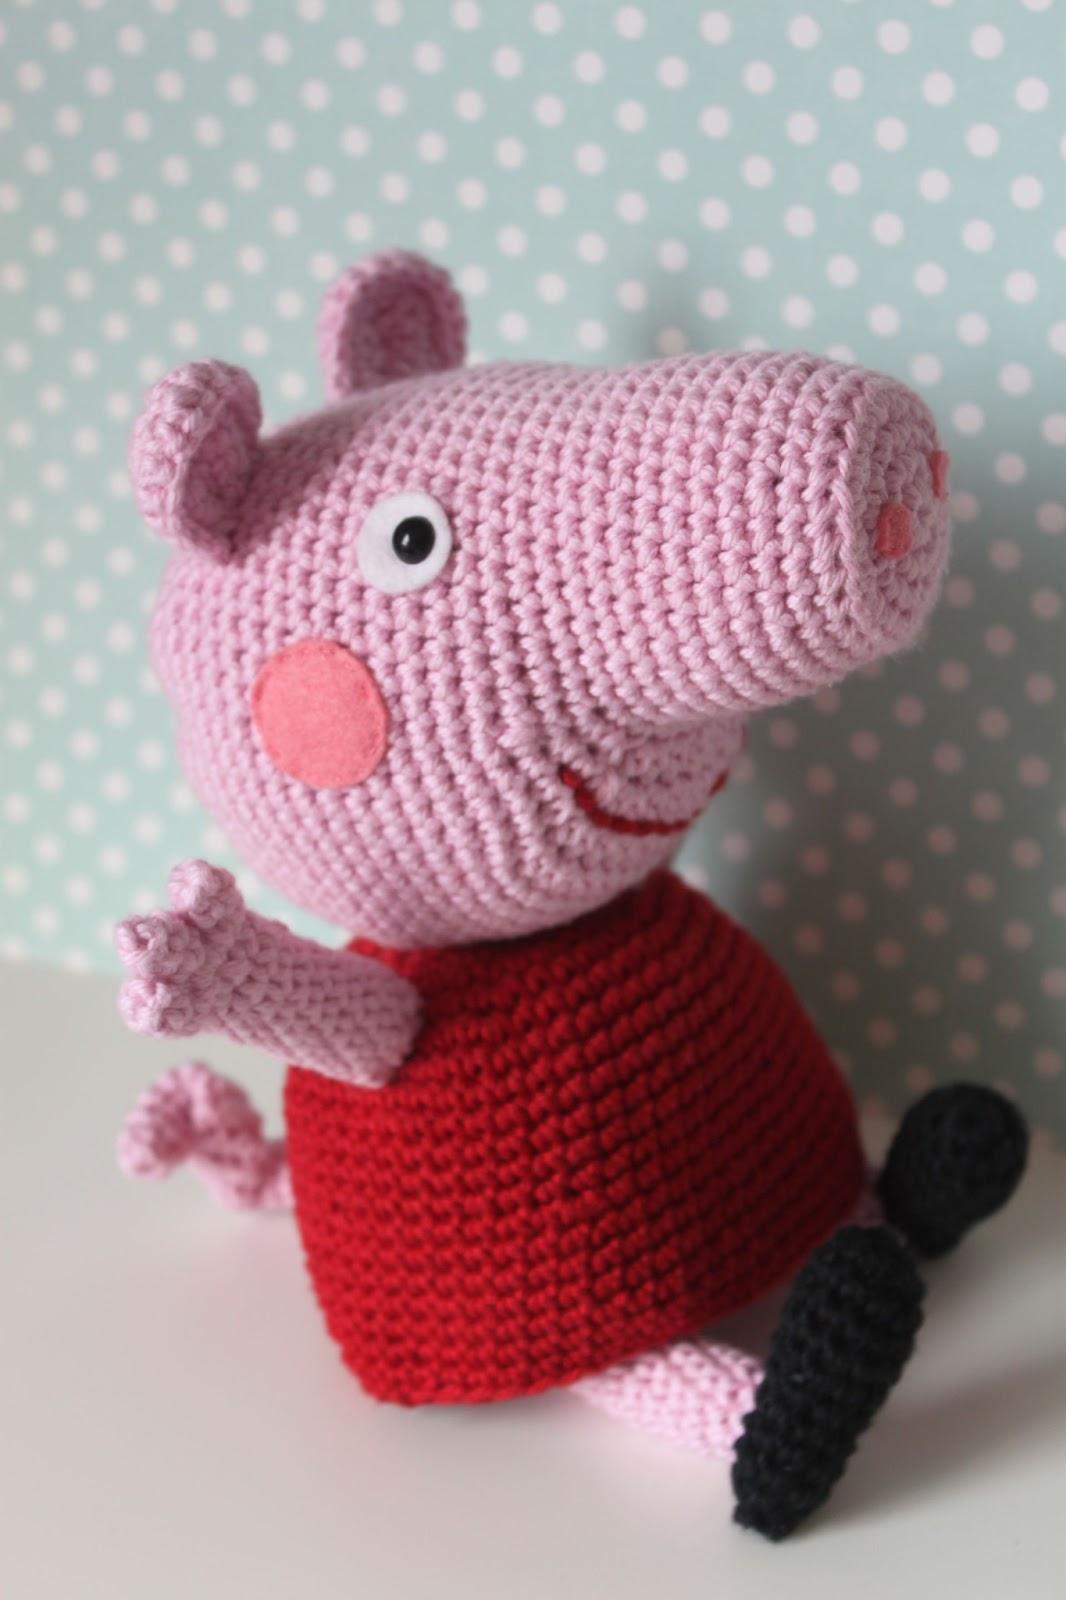 Patron Amigurumi Peppa Pig Grande : lua: Peppa Pig